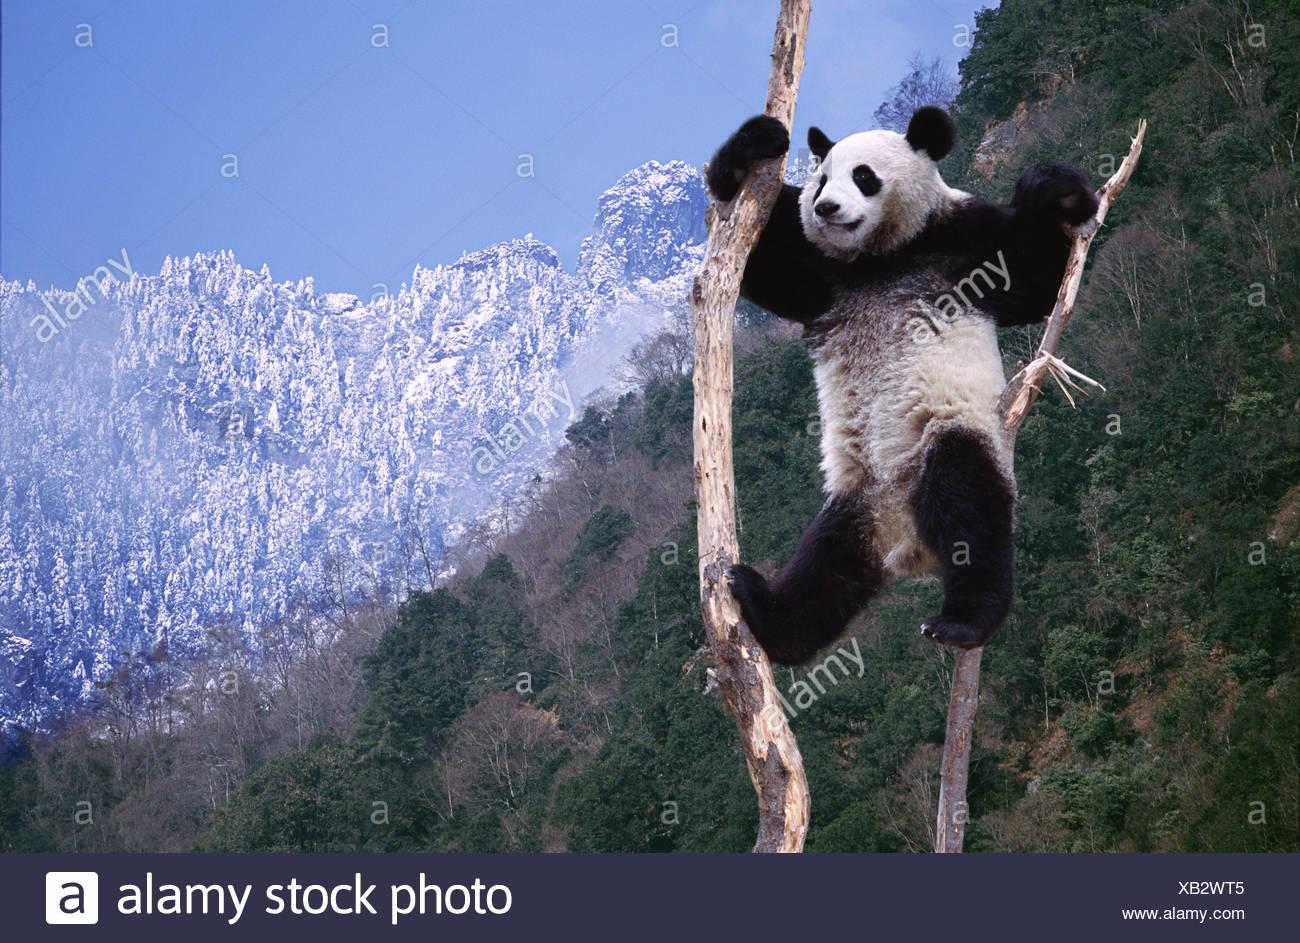 Panda climbing a tree Sichuan China - Stock Image